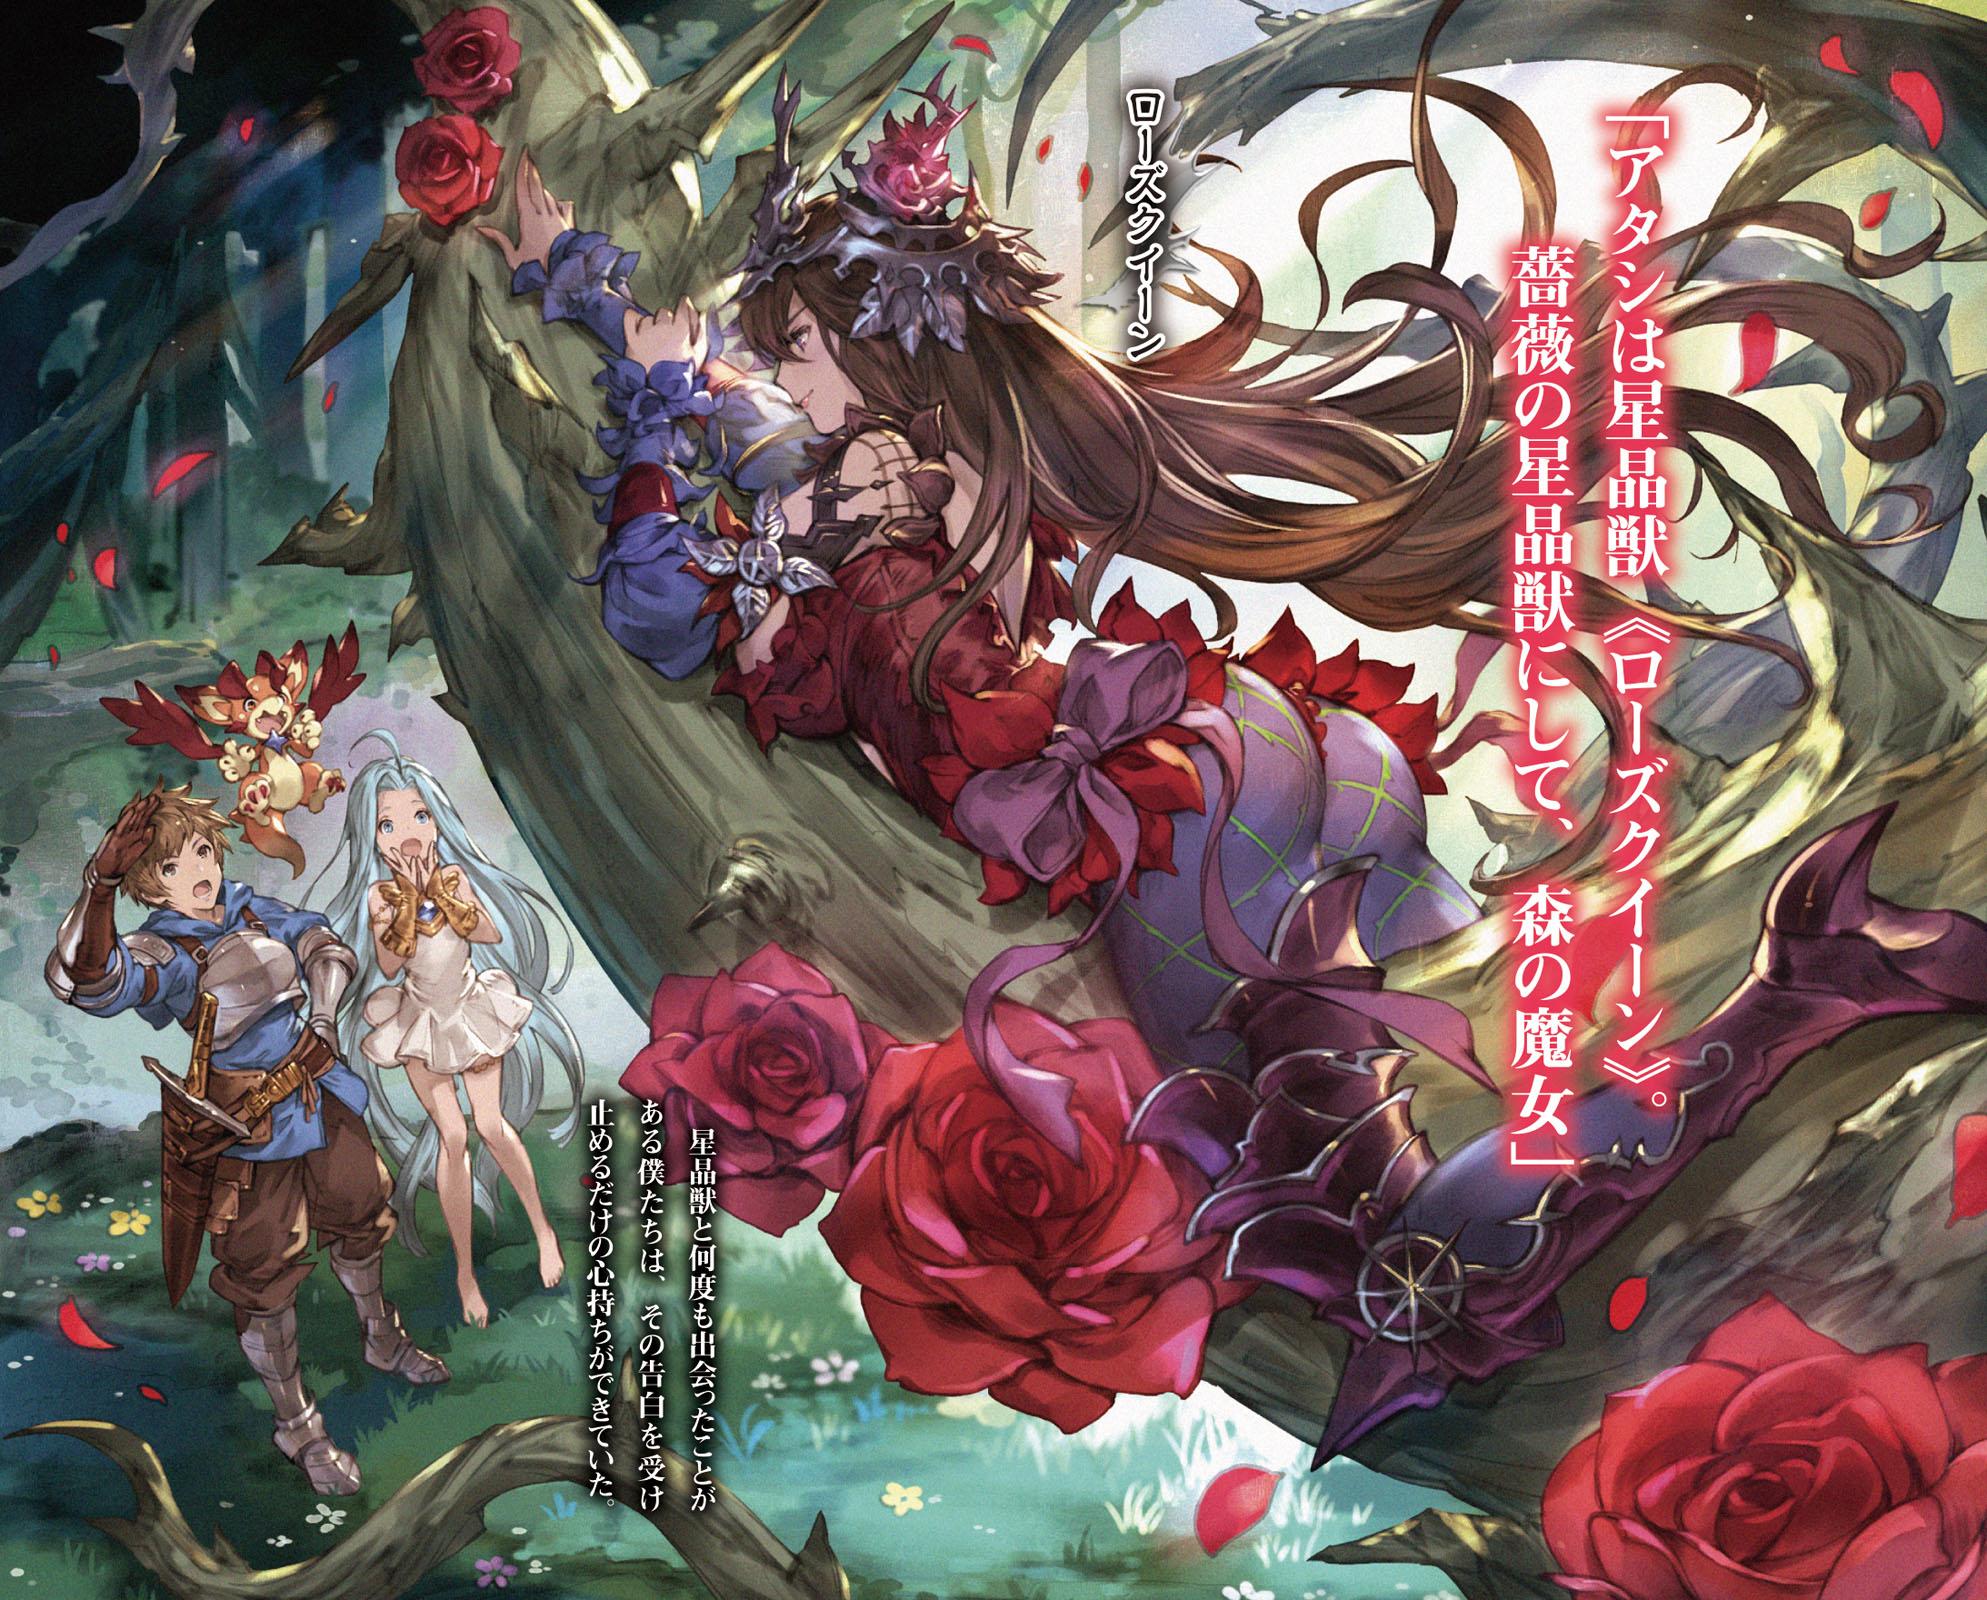 Rosetta (Granblue Fantasy) - Zerochan Anime Image Board